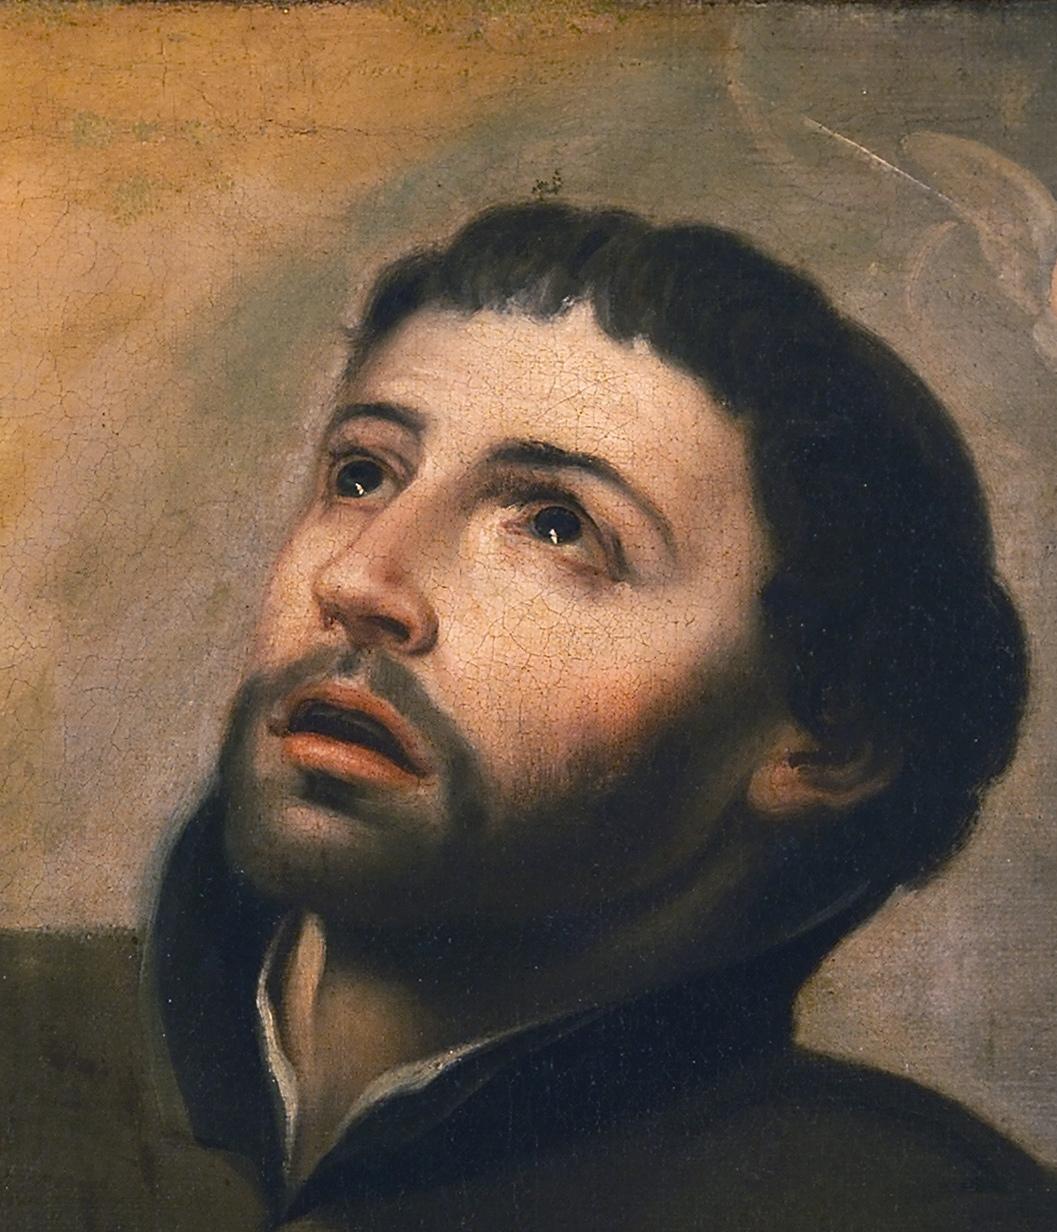 Busto-San-francisco-javier